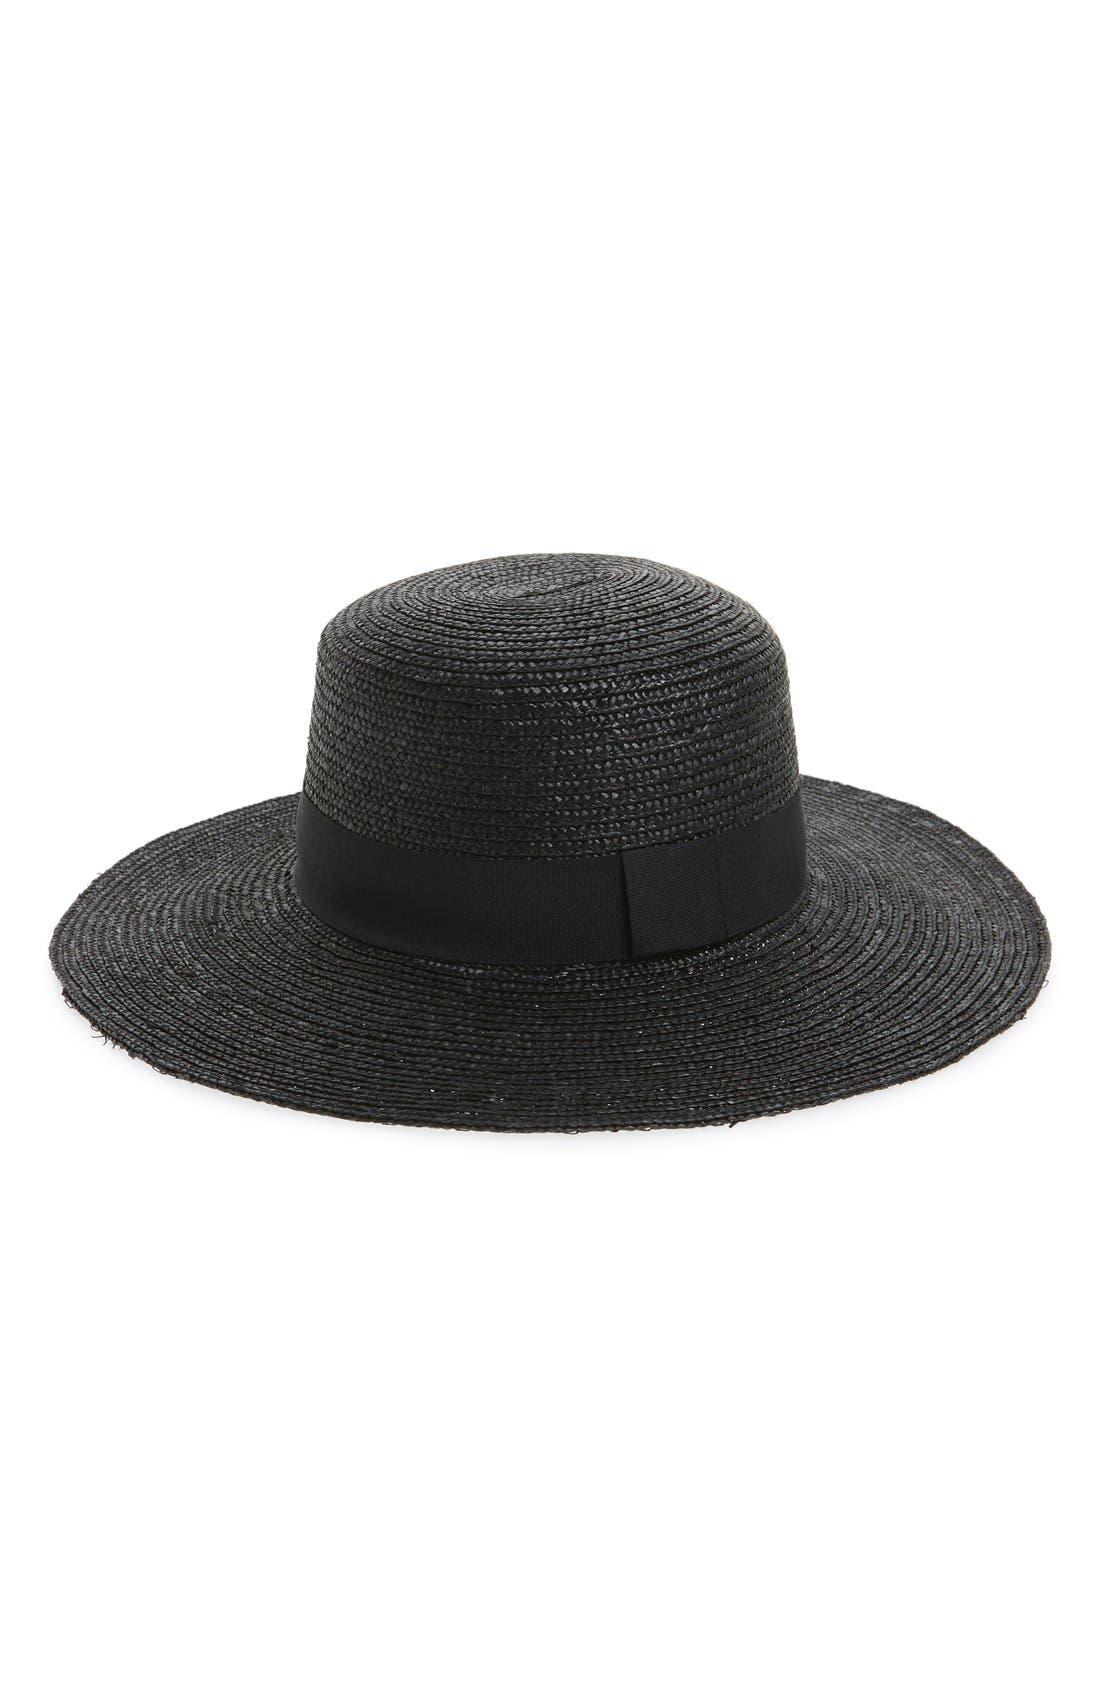 Wide Brim Boater Hat,                         Main,                         color, 001